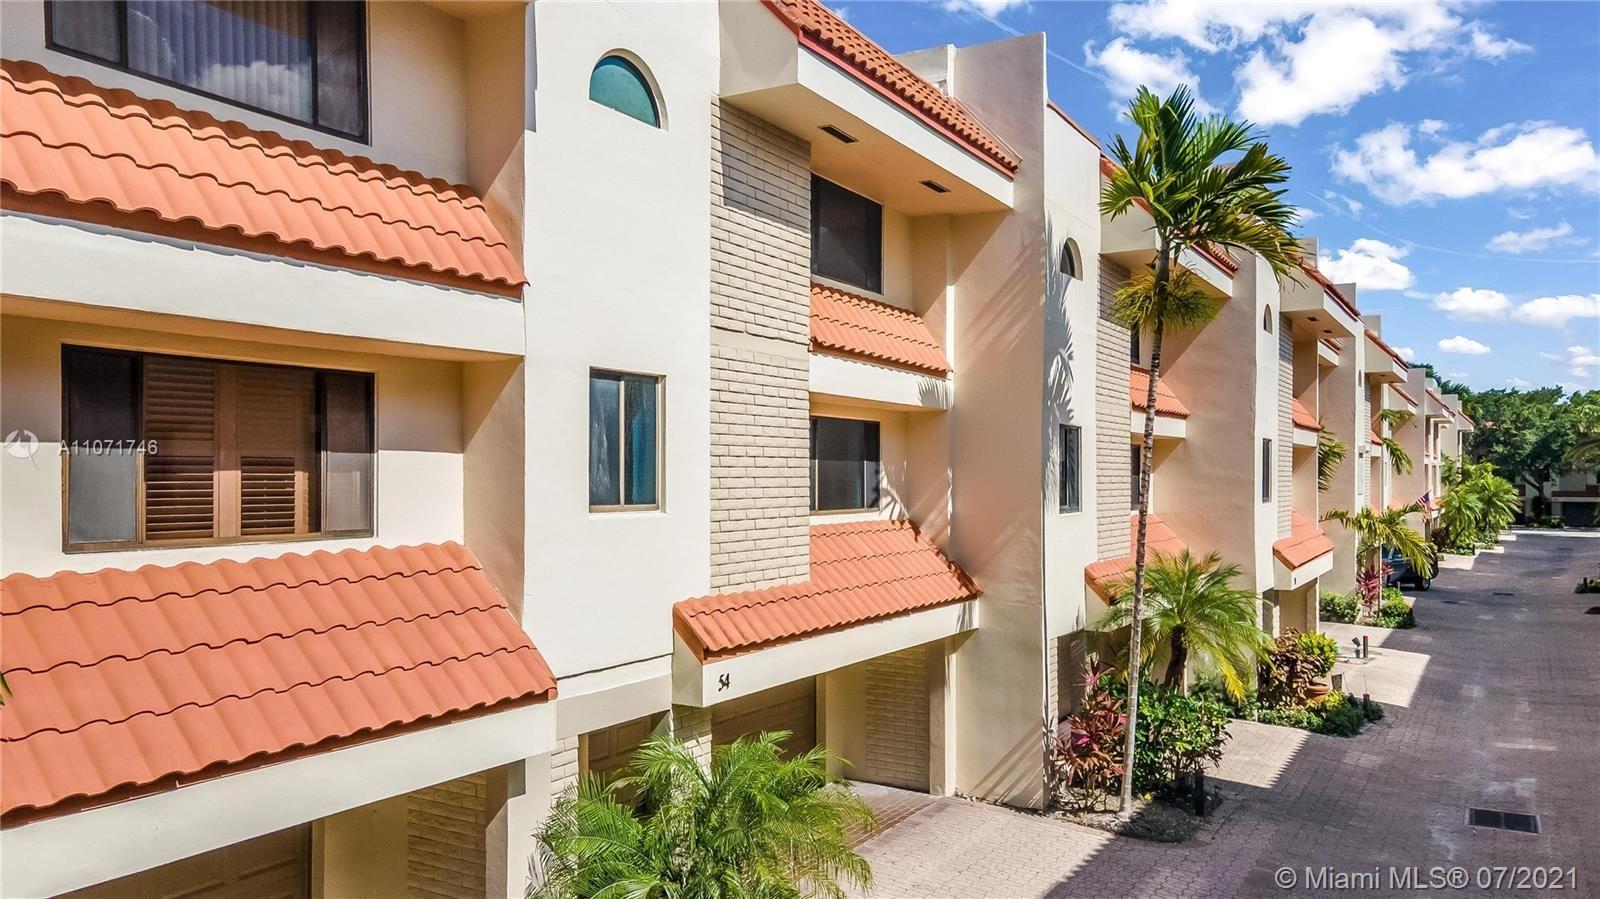 1401 NE 9th Street #54, Fort Lauderdale, FL 33304 - #: A11071746